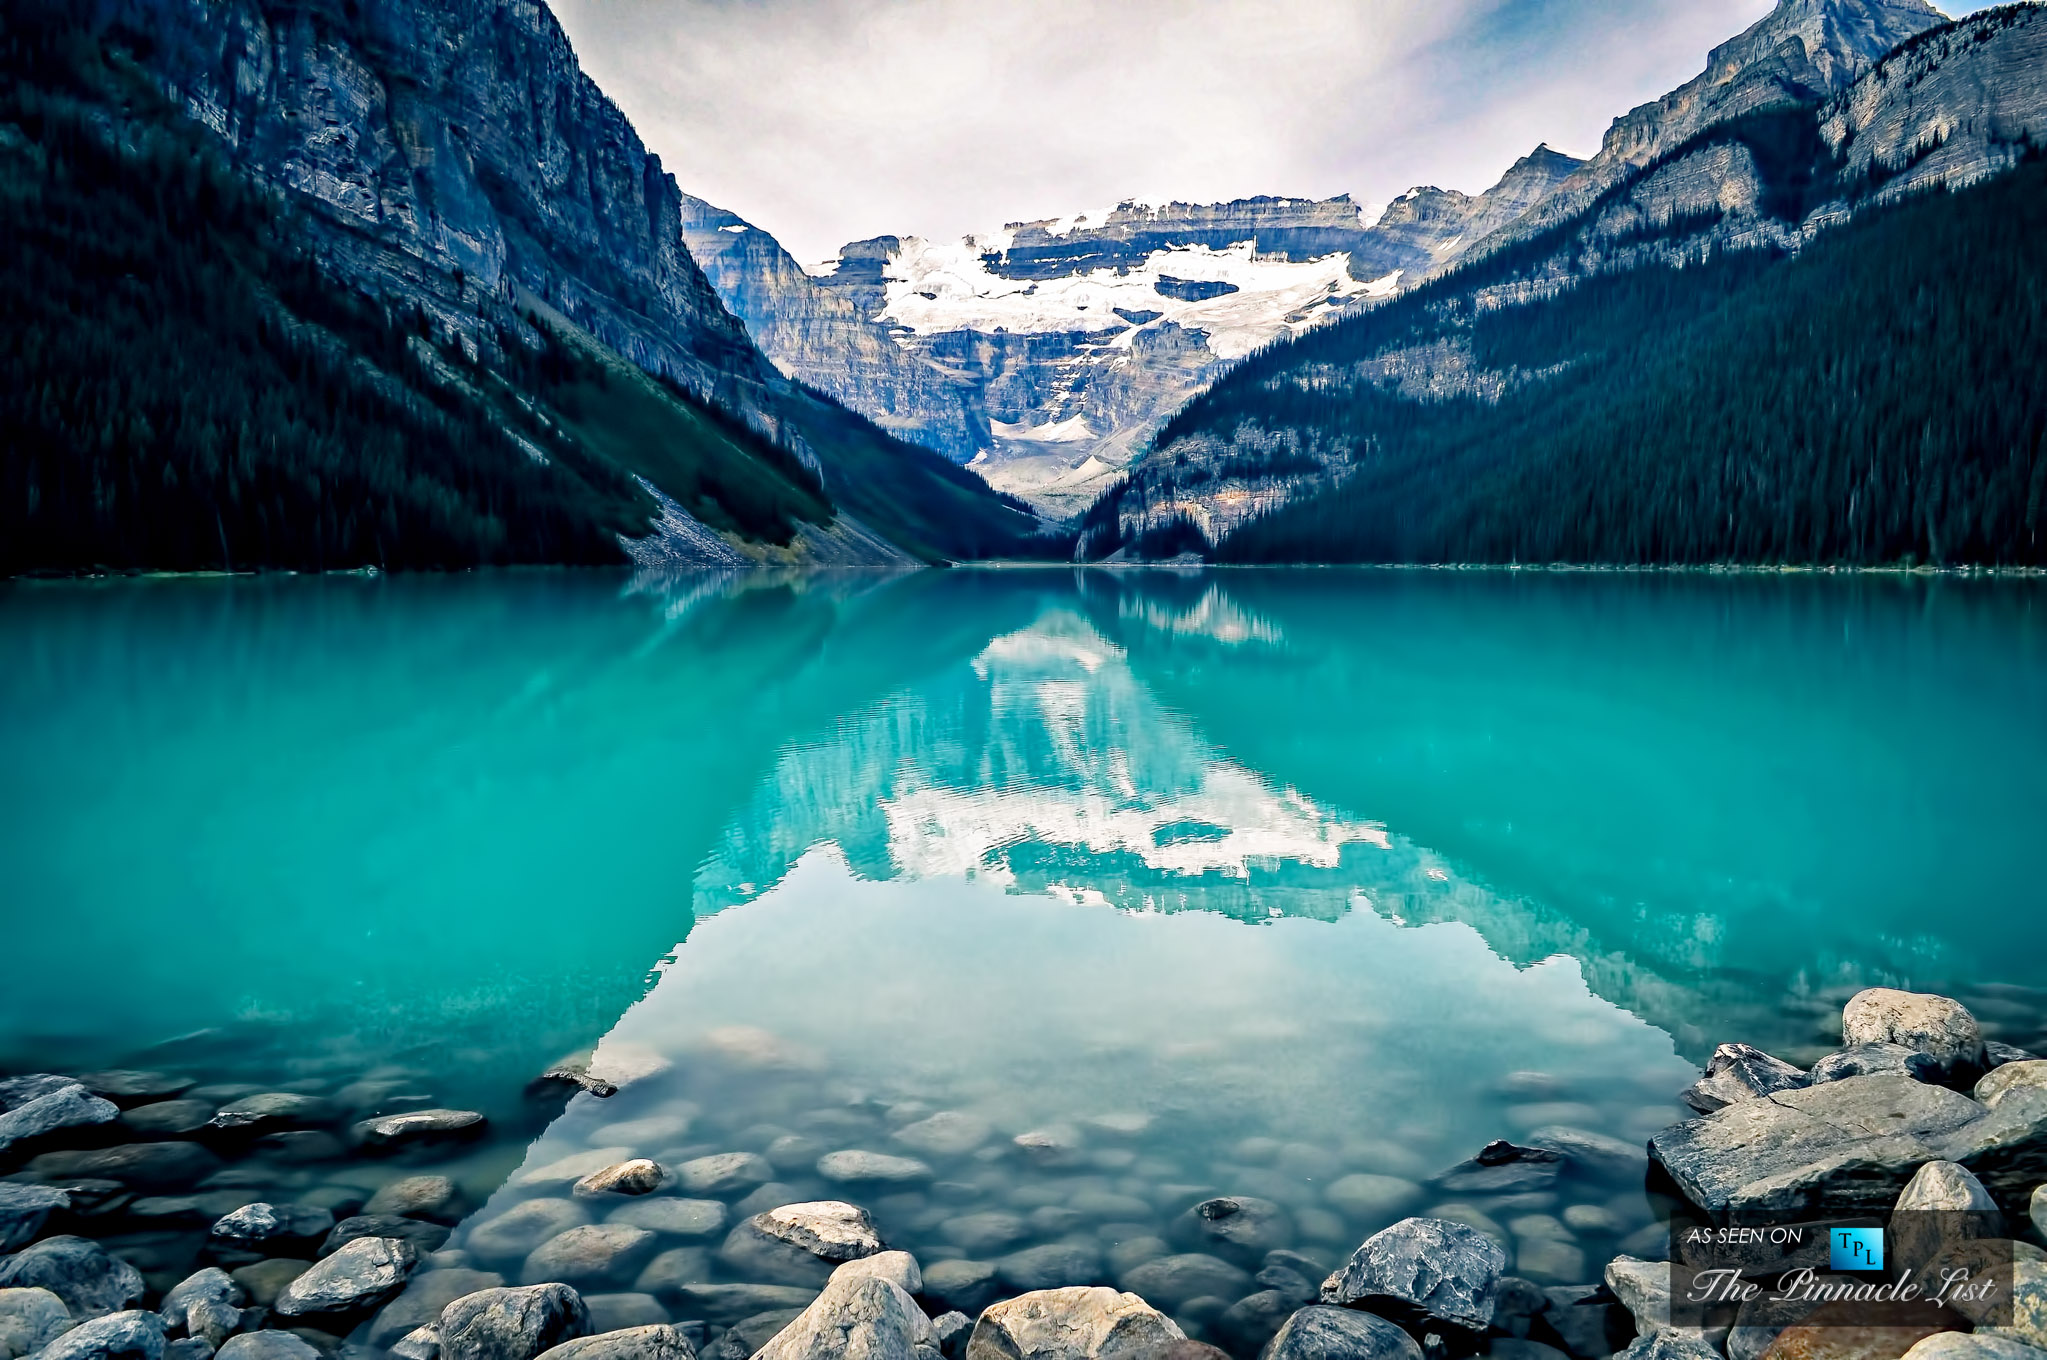 Banff Lake Louise Tourism Photo Gallery - Photos of Banff ...